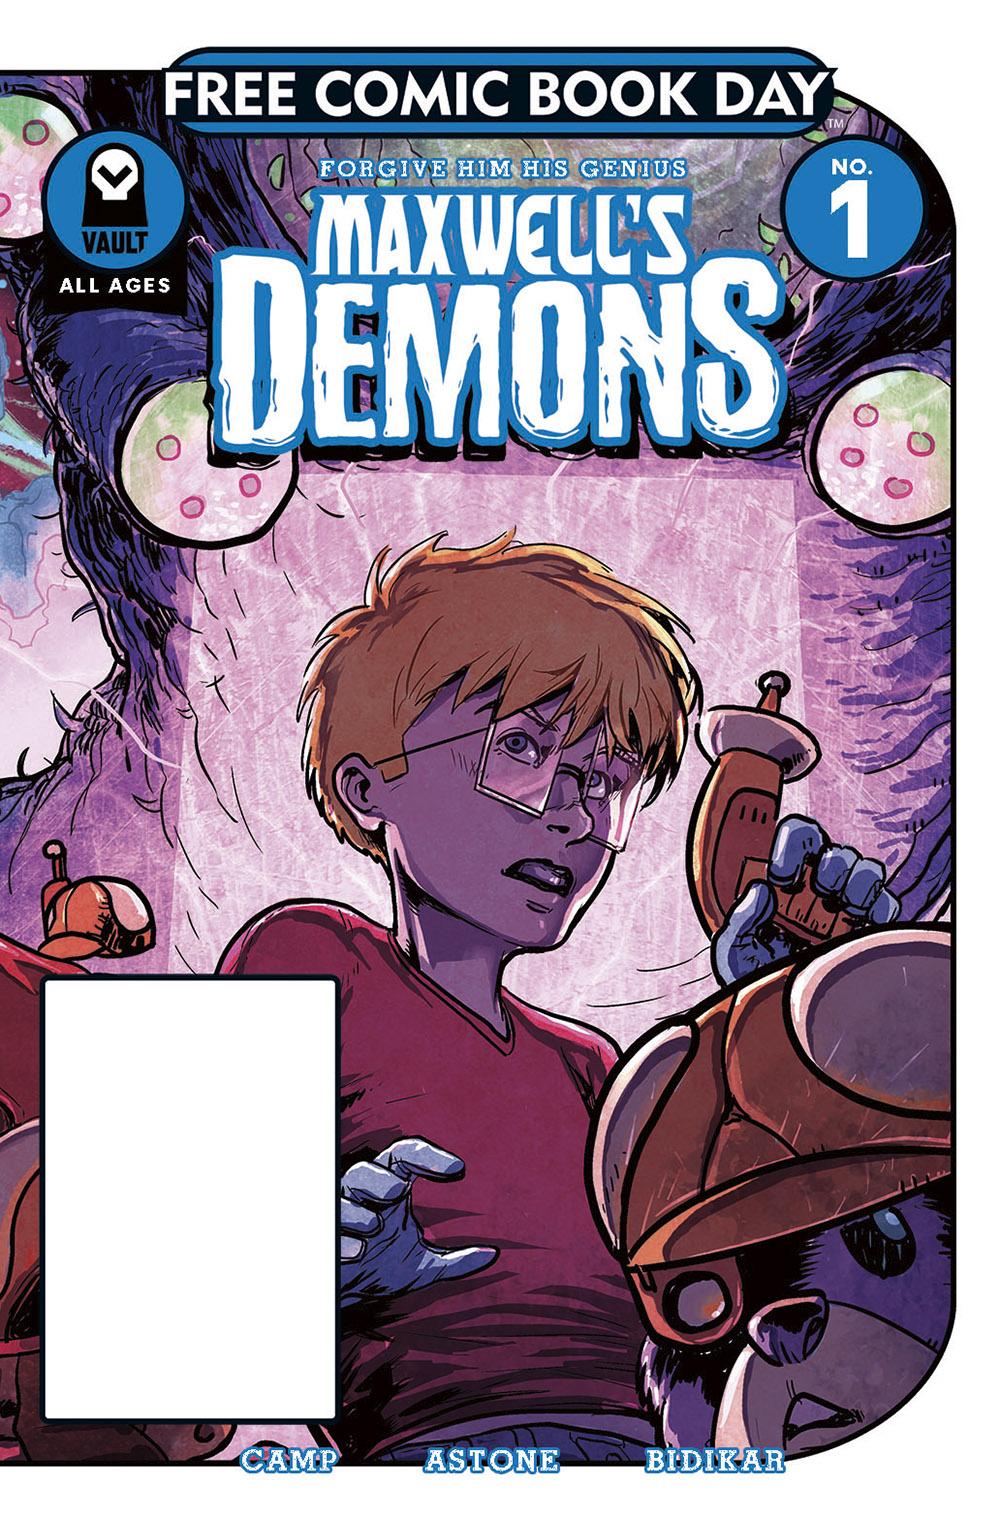 FCBD18_S_Vault_Maxwell's Demons 1.jpg